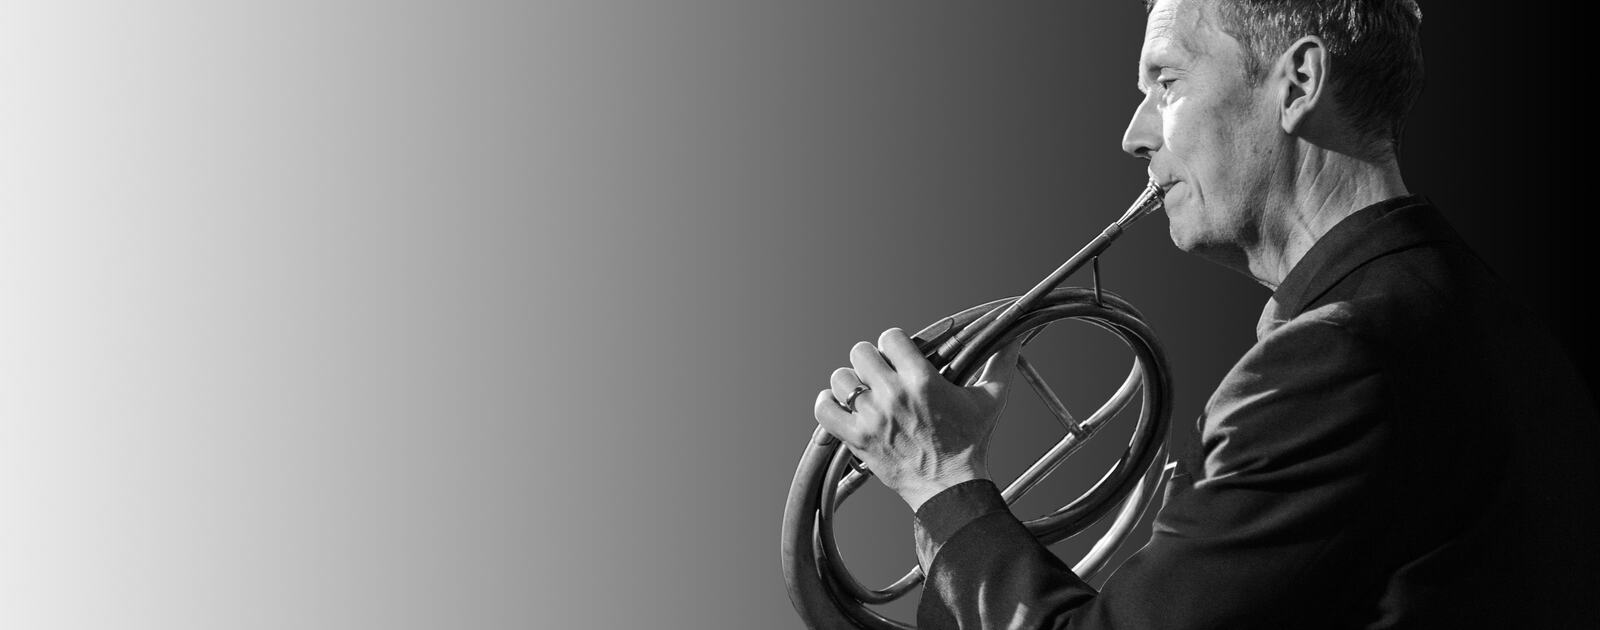 Roger Montgomery, musician